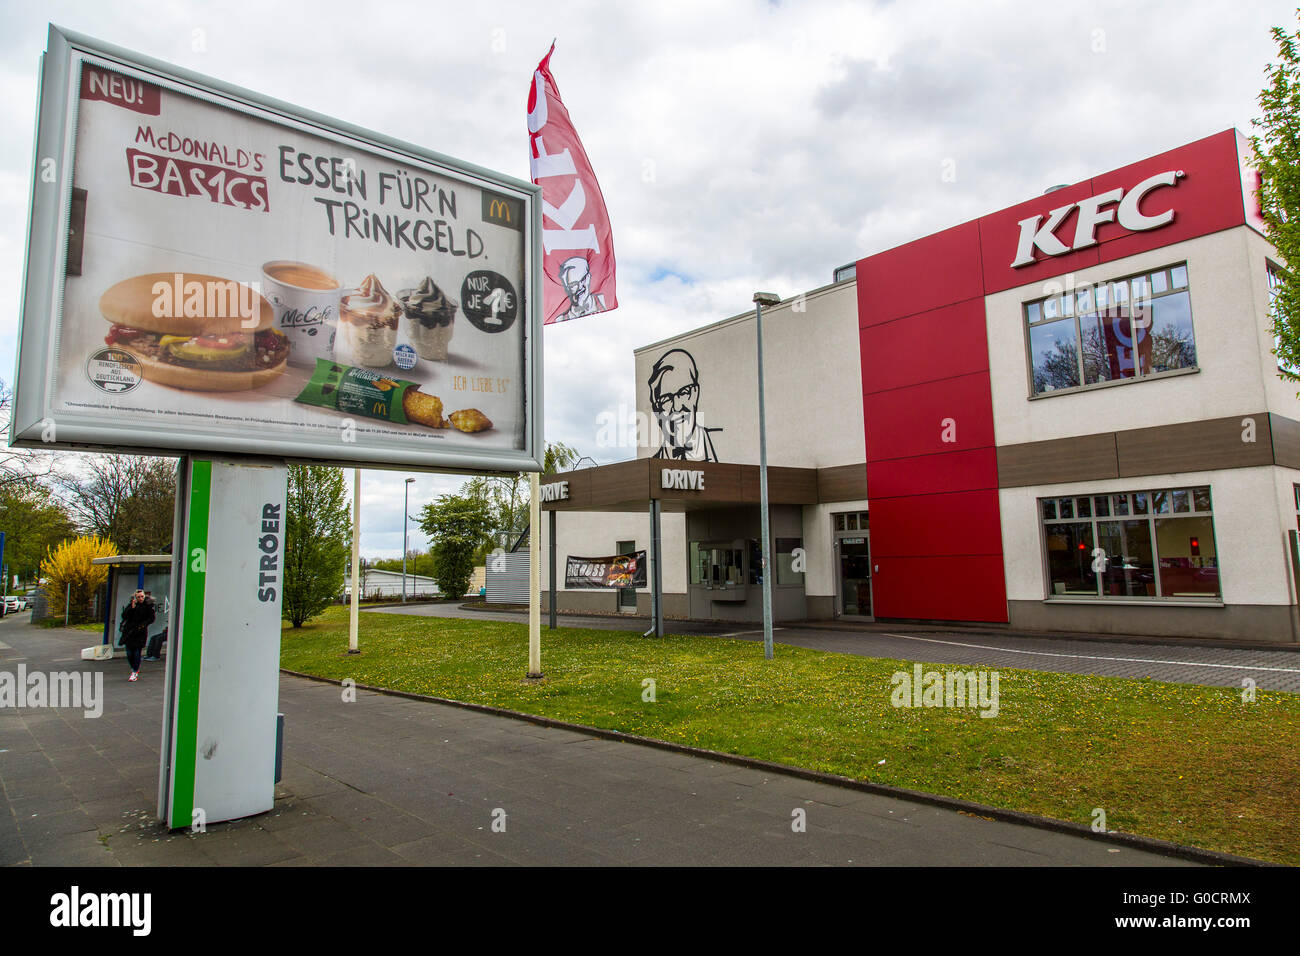 Poster advertising for McDonalds fast food restaurants, in ...